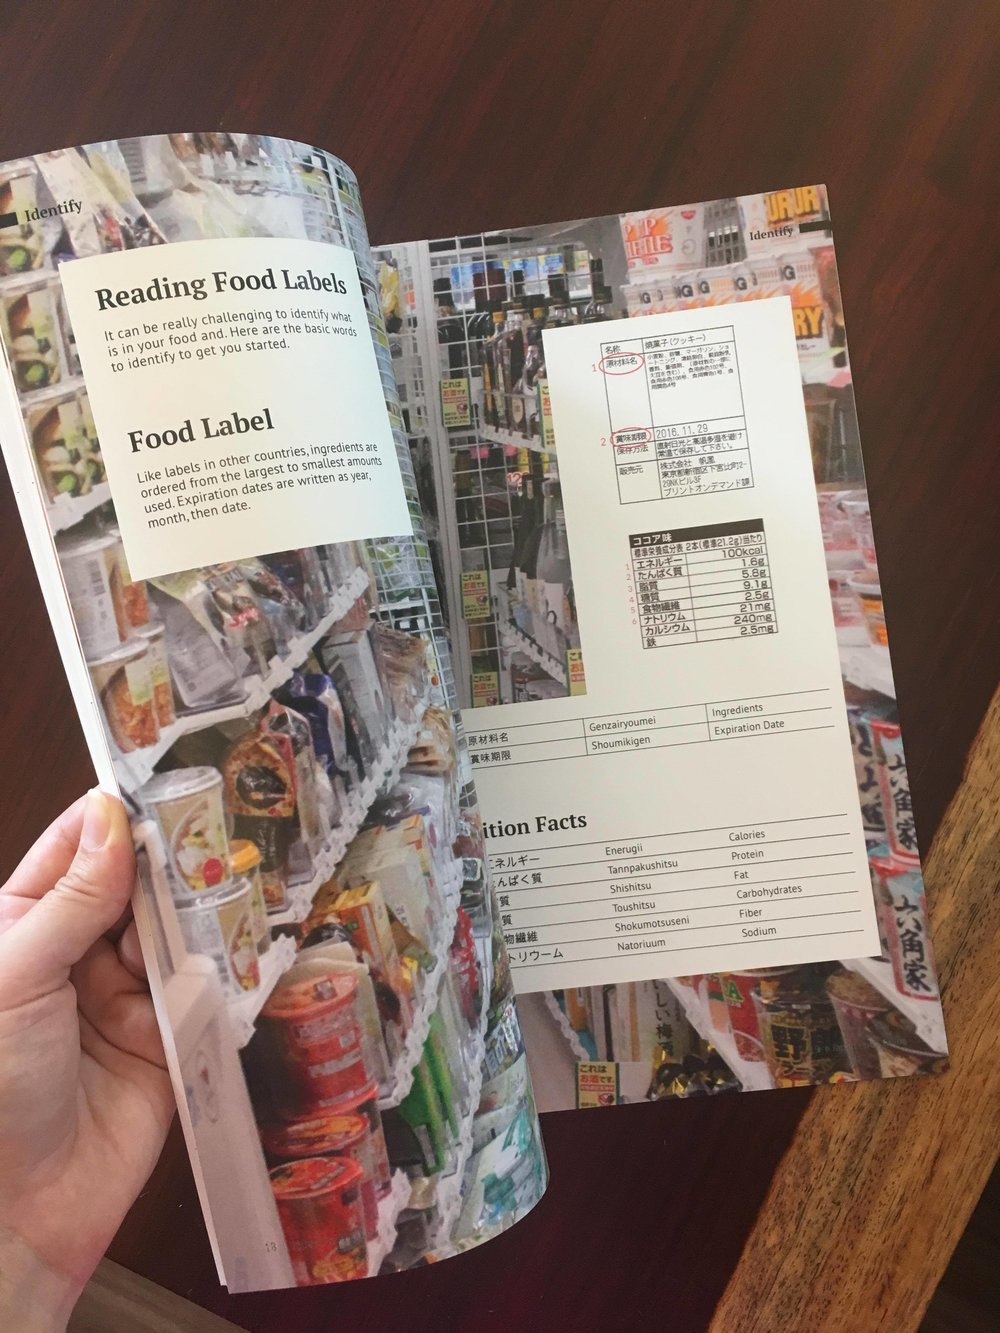 Japan Food Guidebook Labels